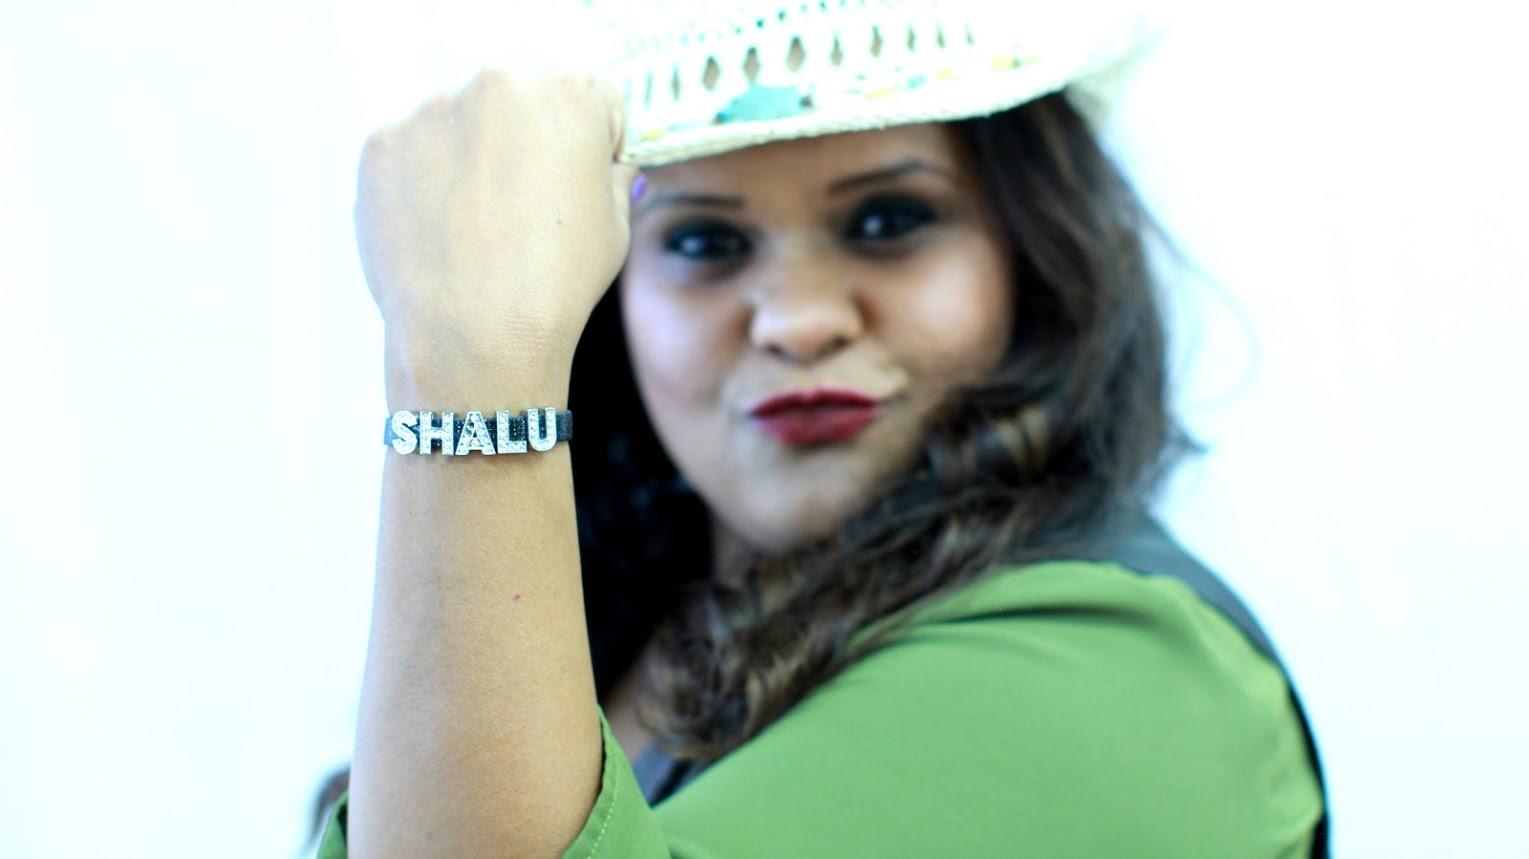 Shalu